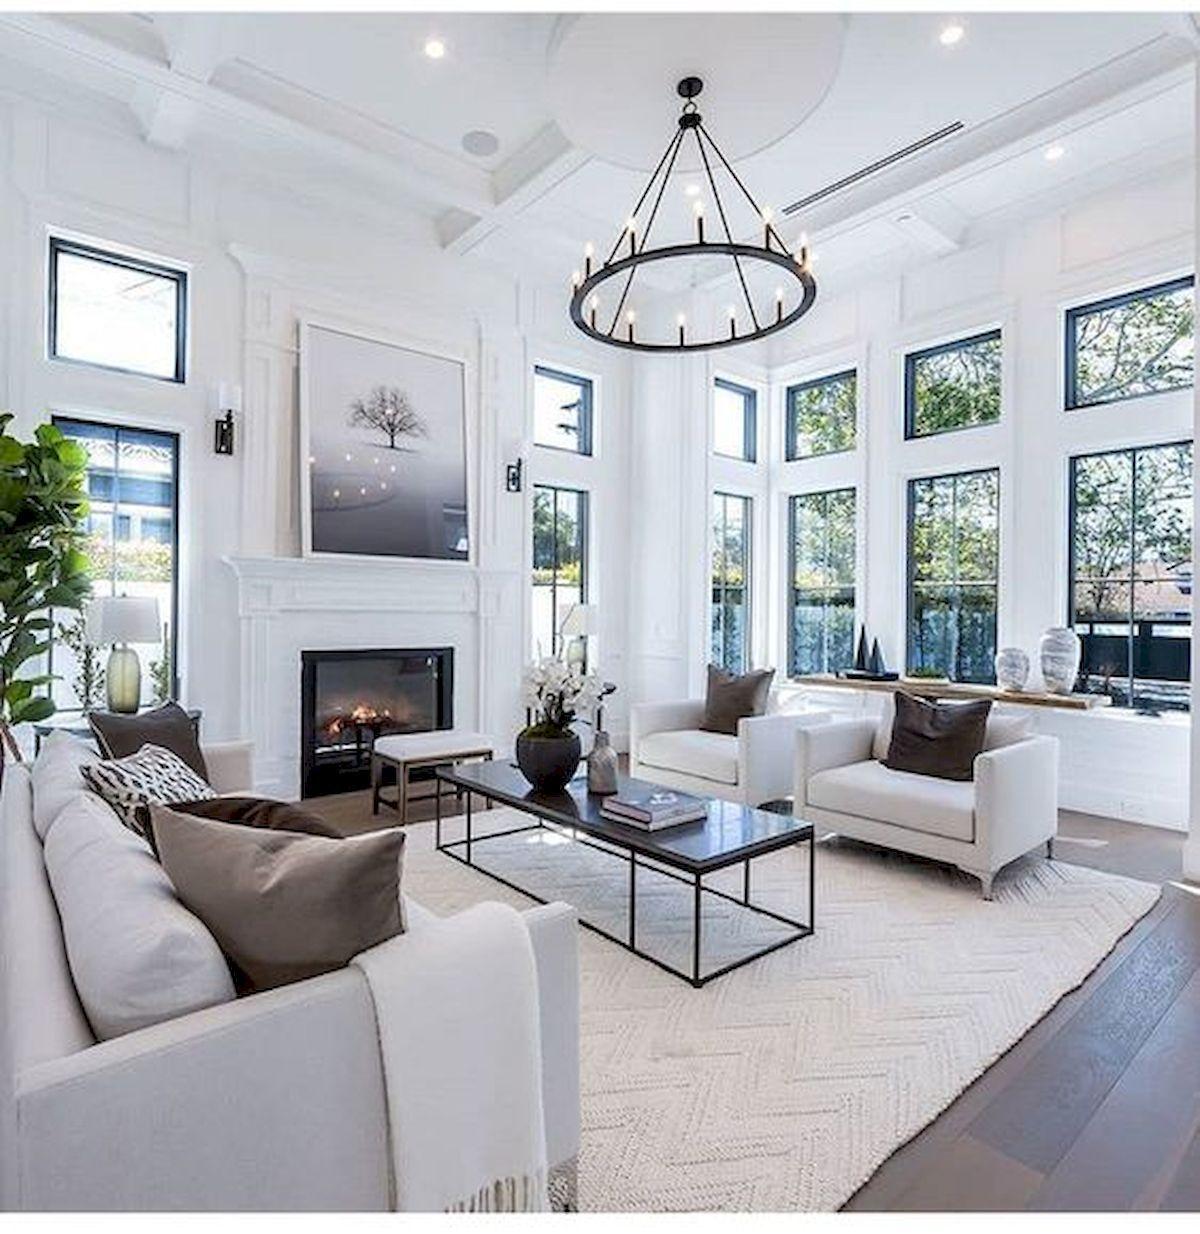 Formal Living Room: 50 Excellent Formal Living Room Decor Ideas And Remodel